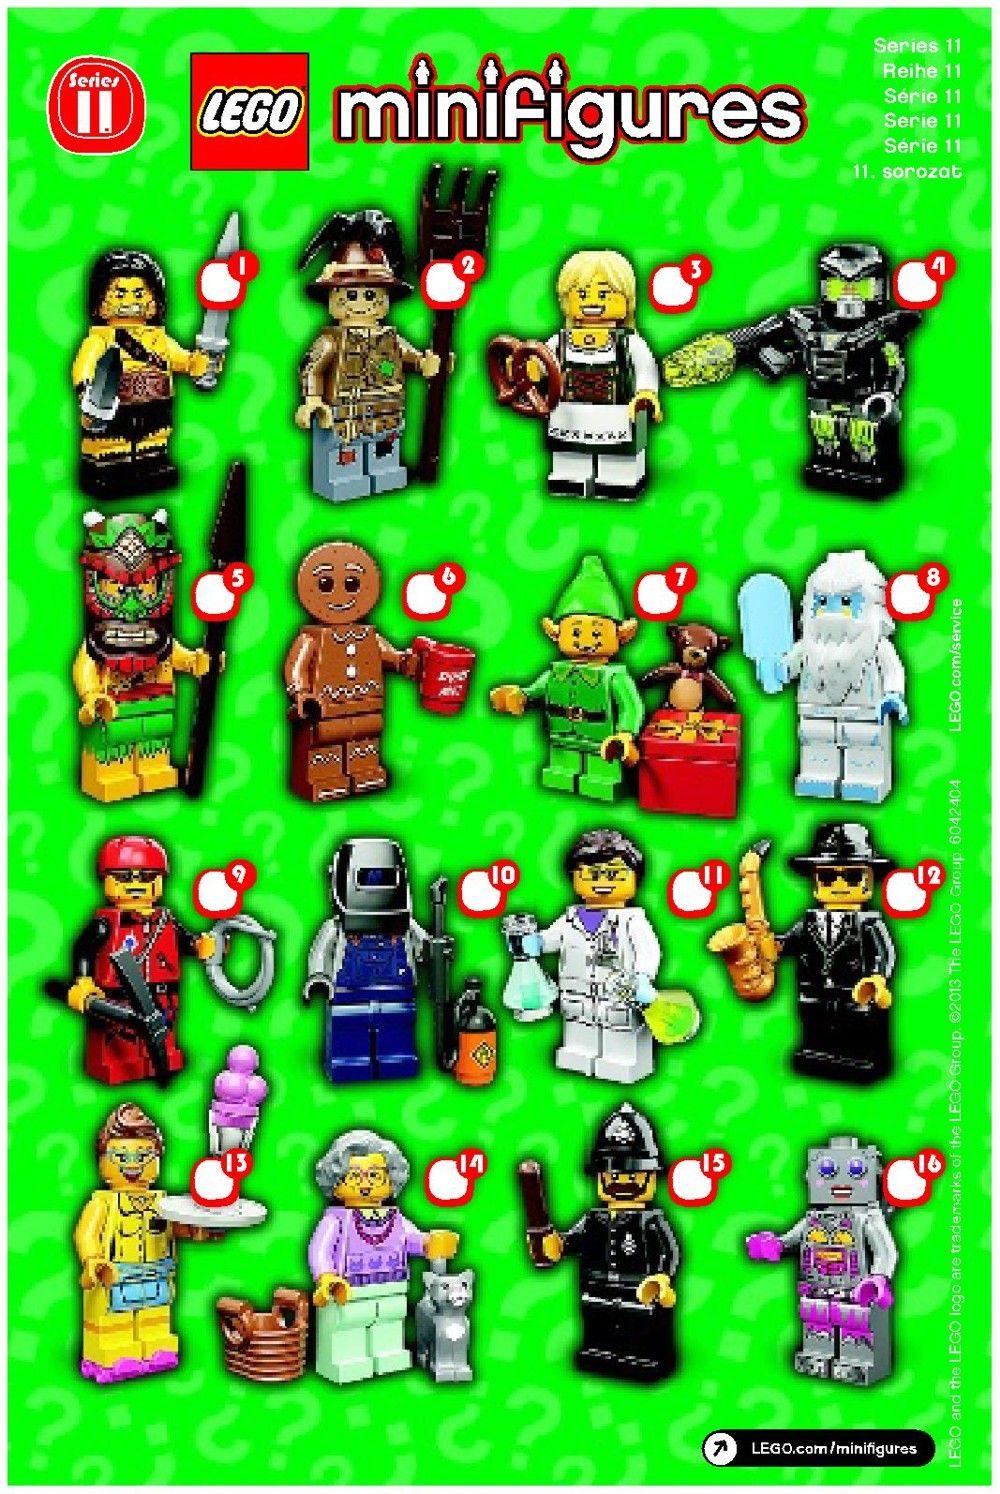 Mini Figures - LEGO Minifigures Series 11 [Lego 71002 ...